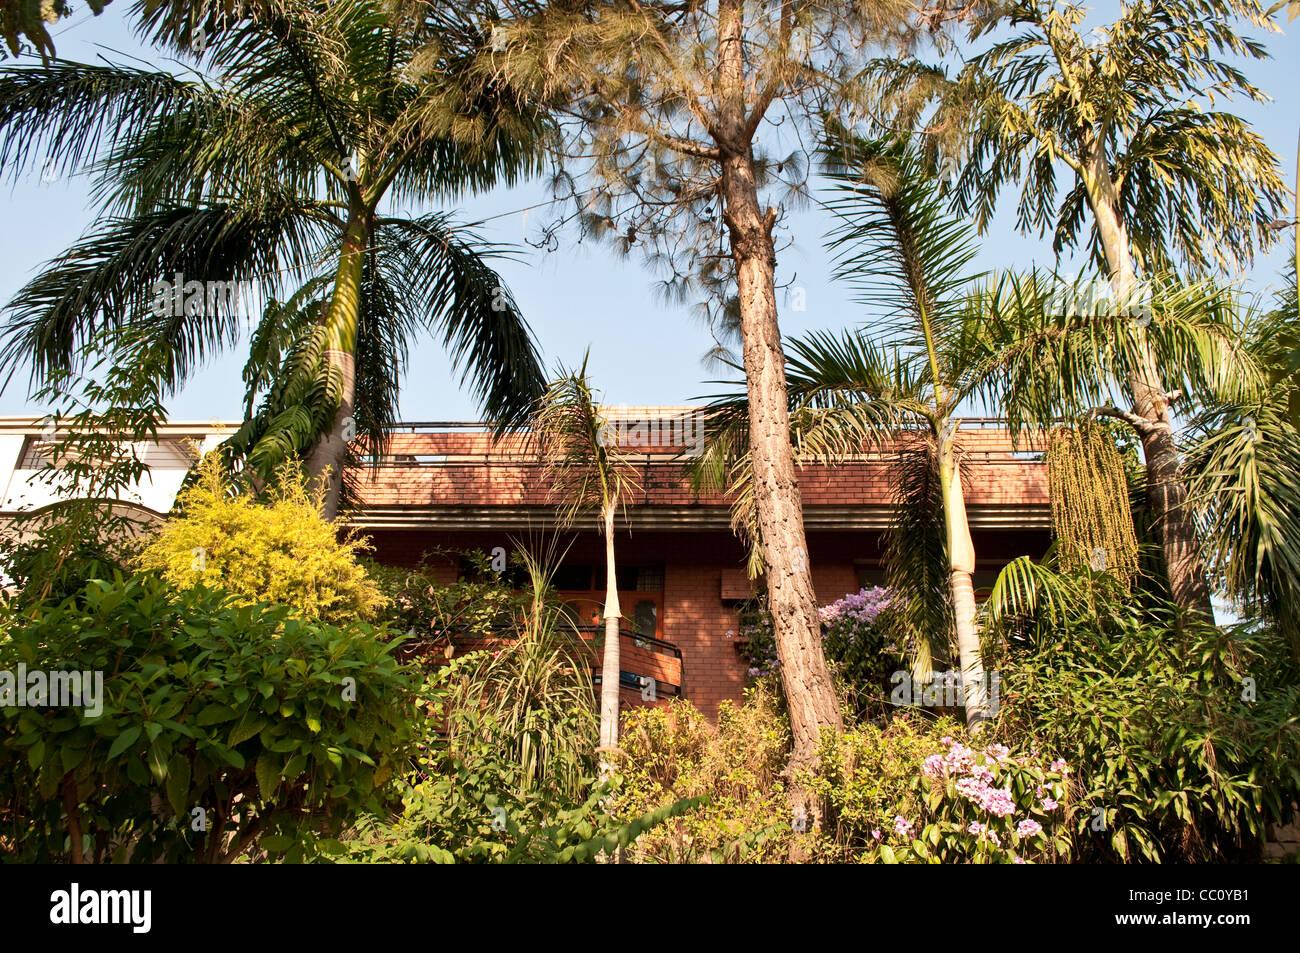 Posh residential house, Chandigarh, India - Stock Image